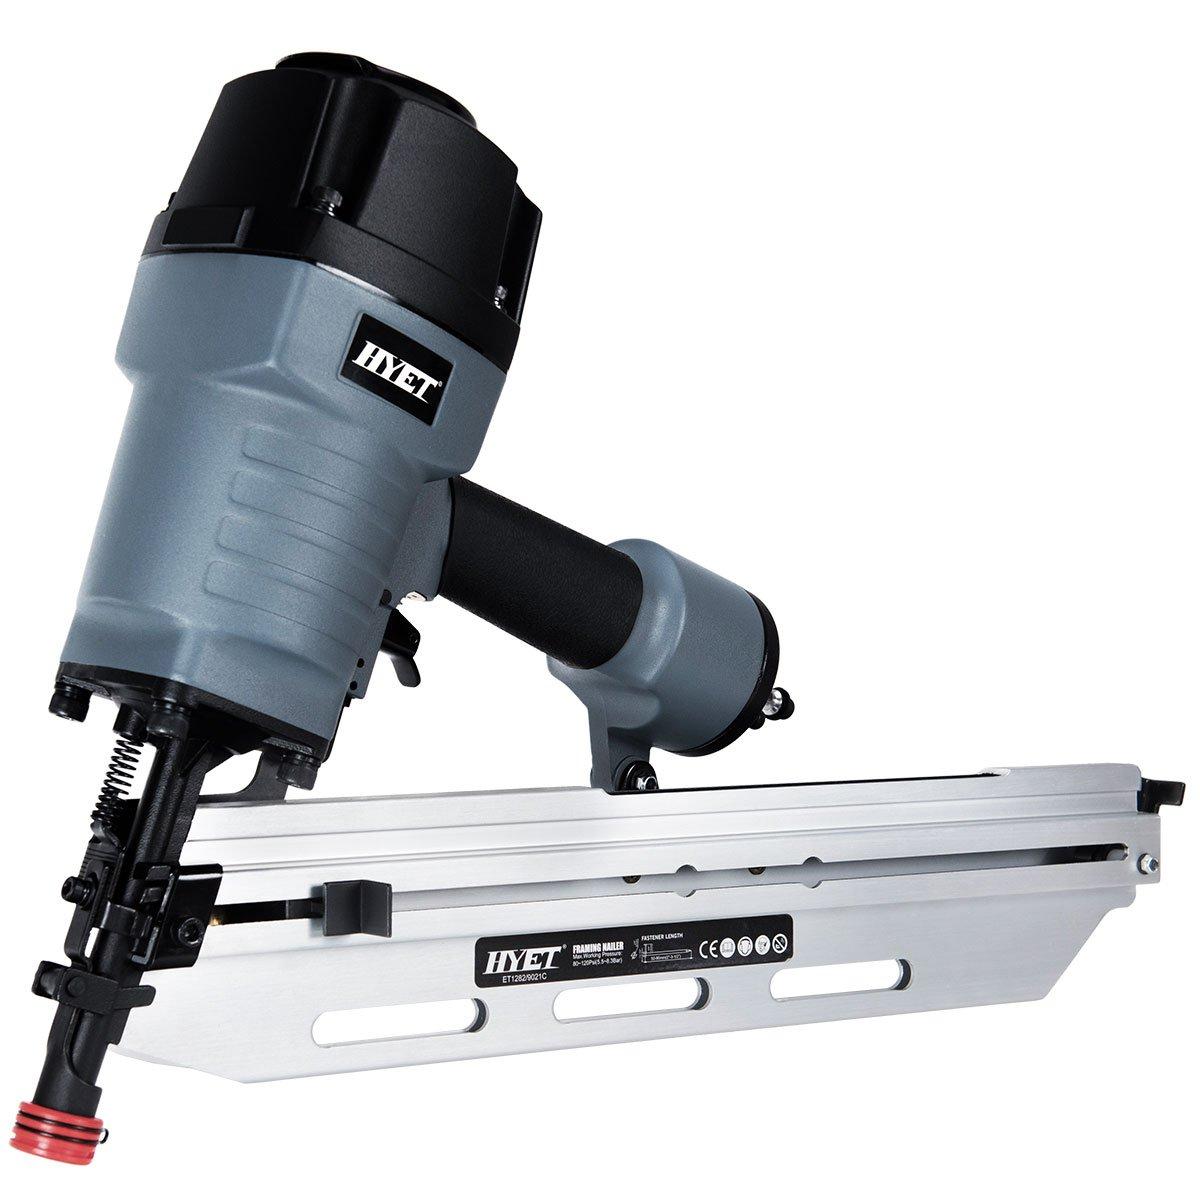 Goplus 21-Degree Air Brad Nailer Available for Nailing Planks & Ceilings Full-Head Framing Nailer